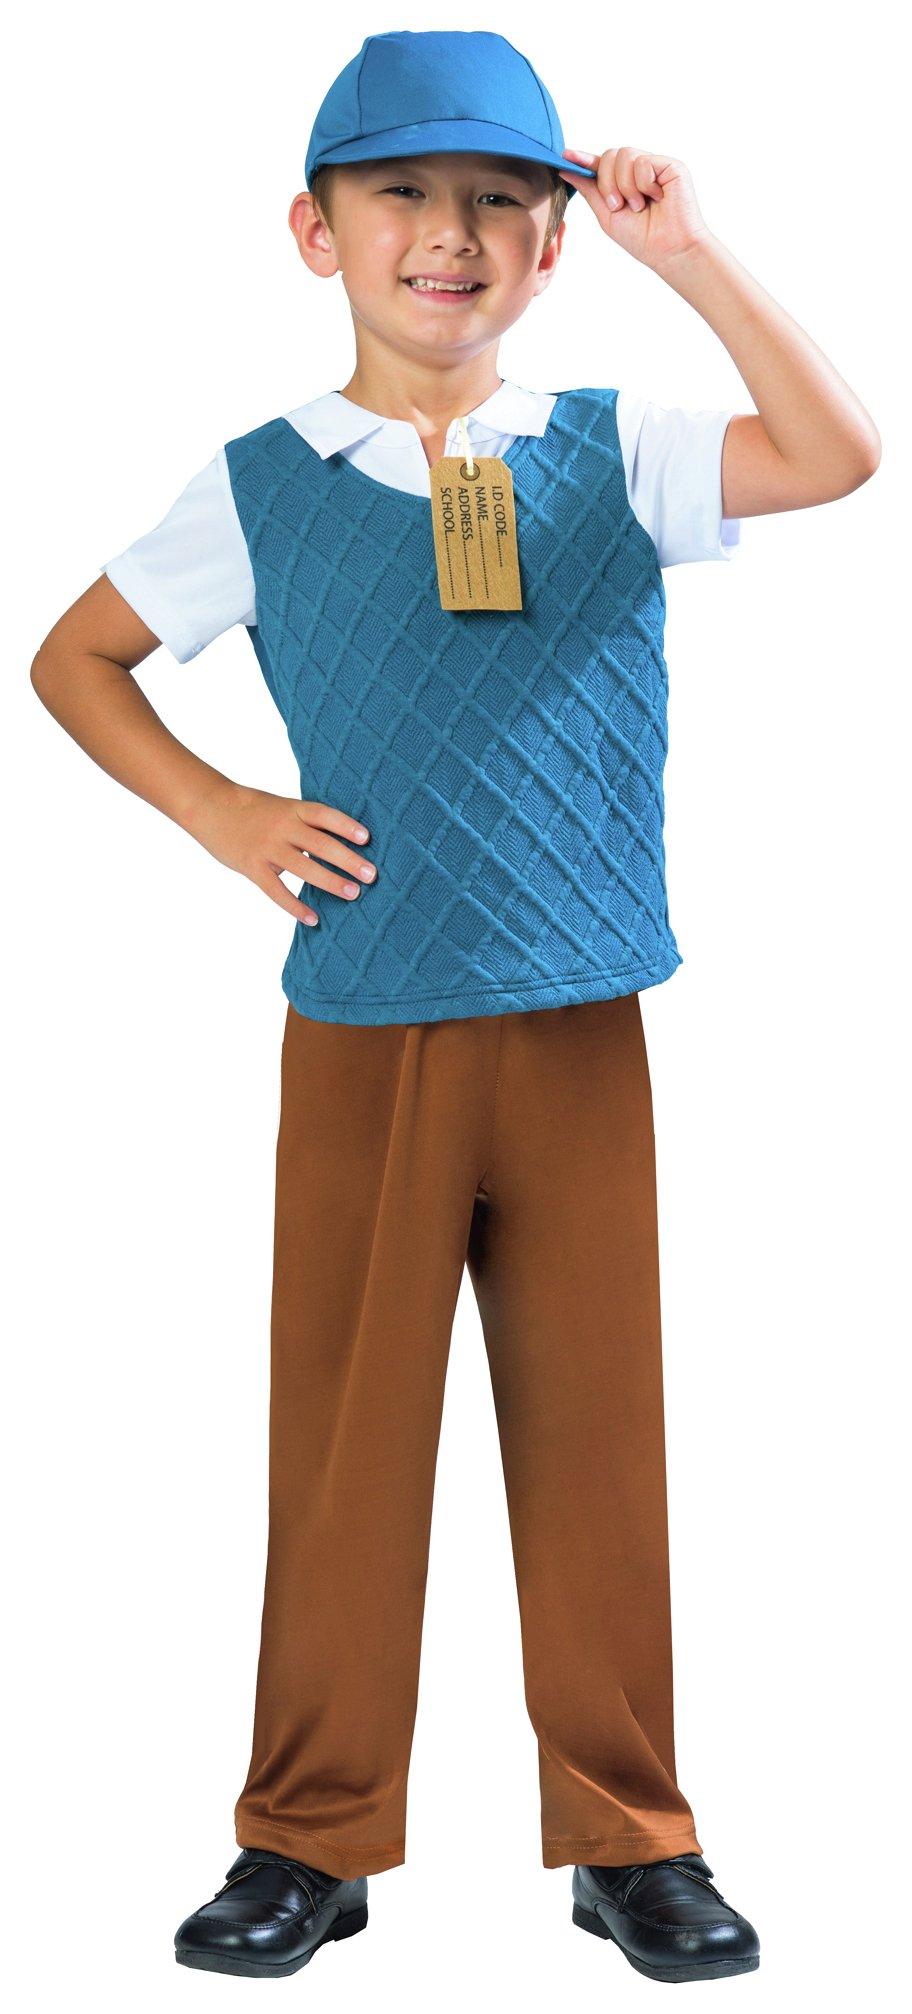 Image of Amscan Evacuee Boy Costume - 3 - 4 Years.